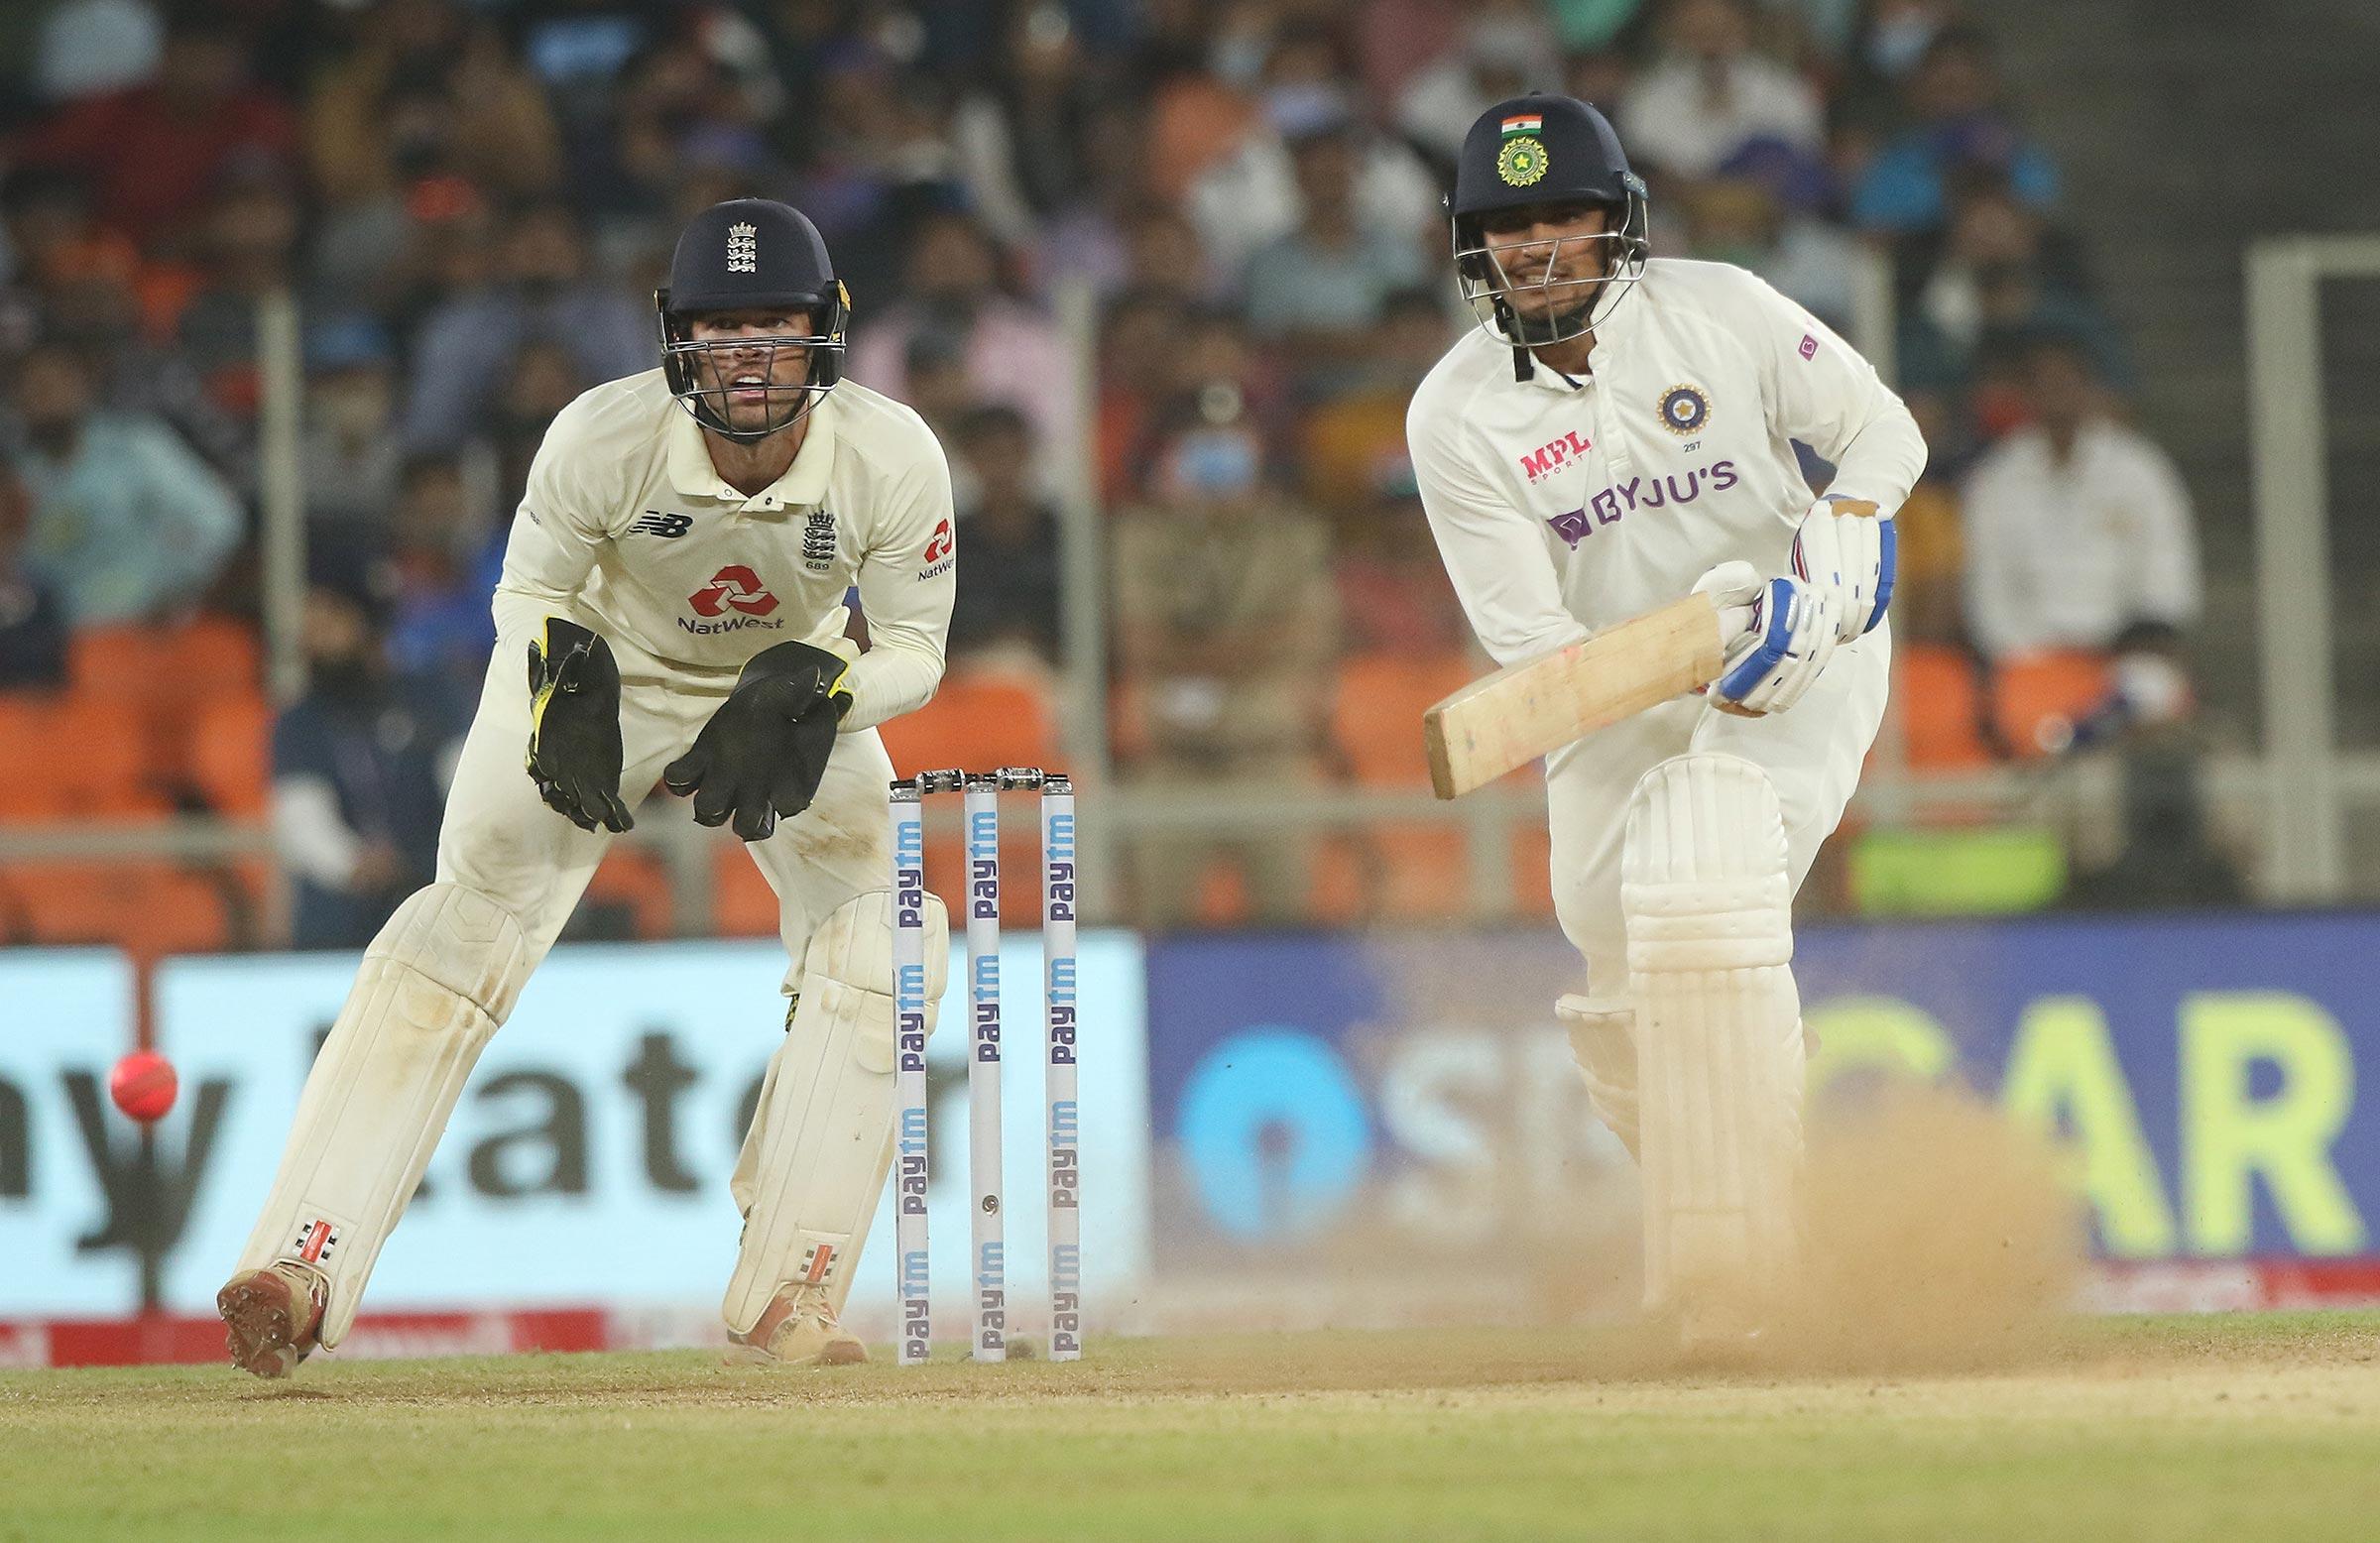 Shubman Gill bats in India's second innings // BCCI-Sportzpics